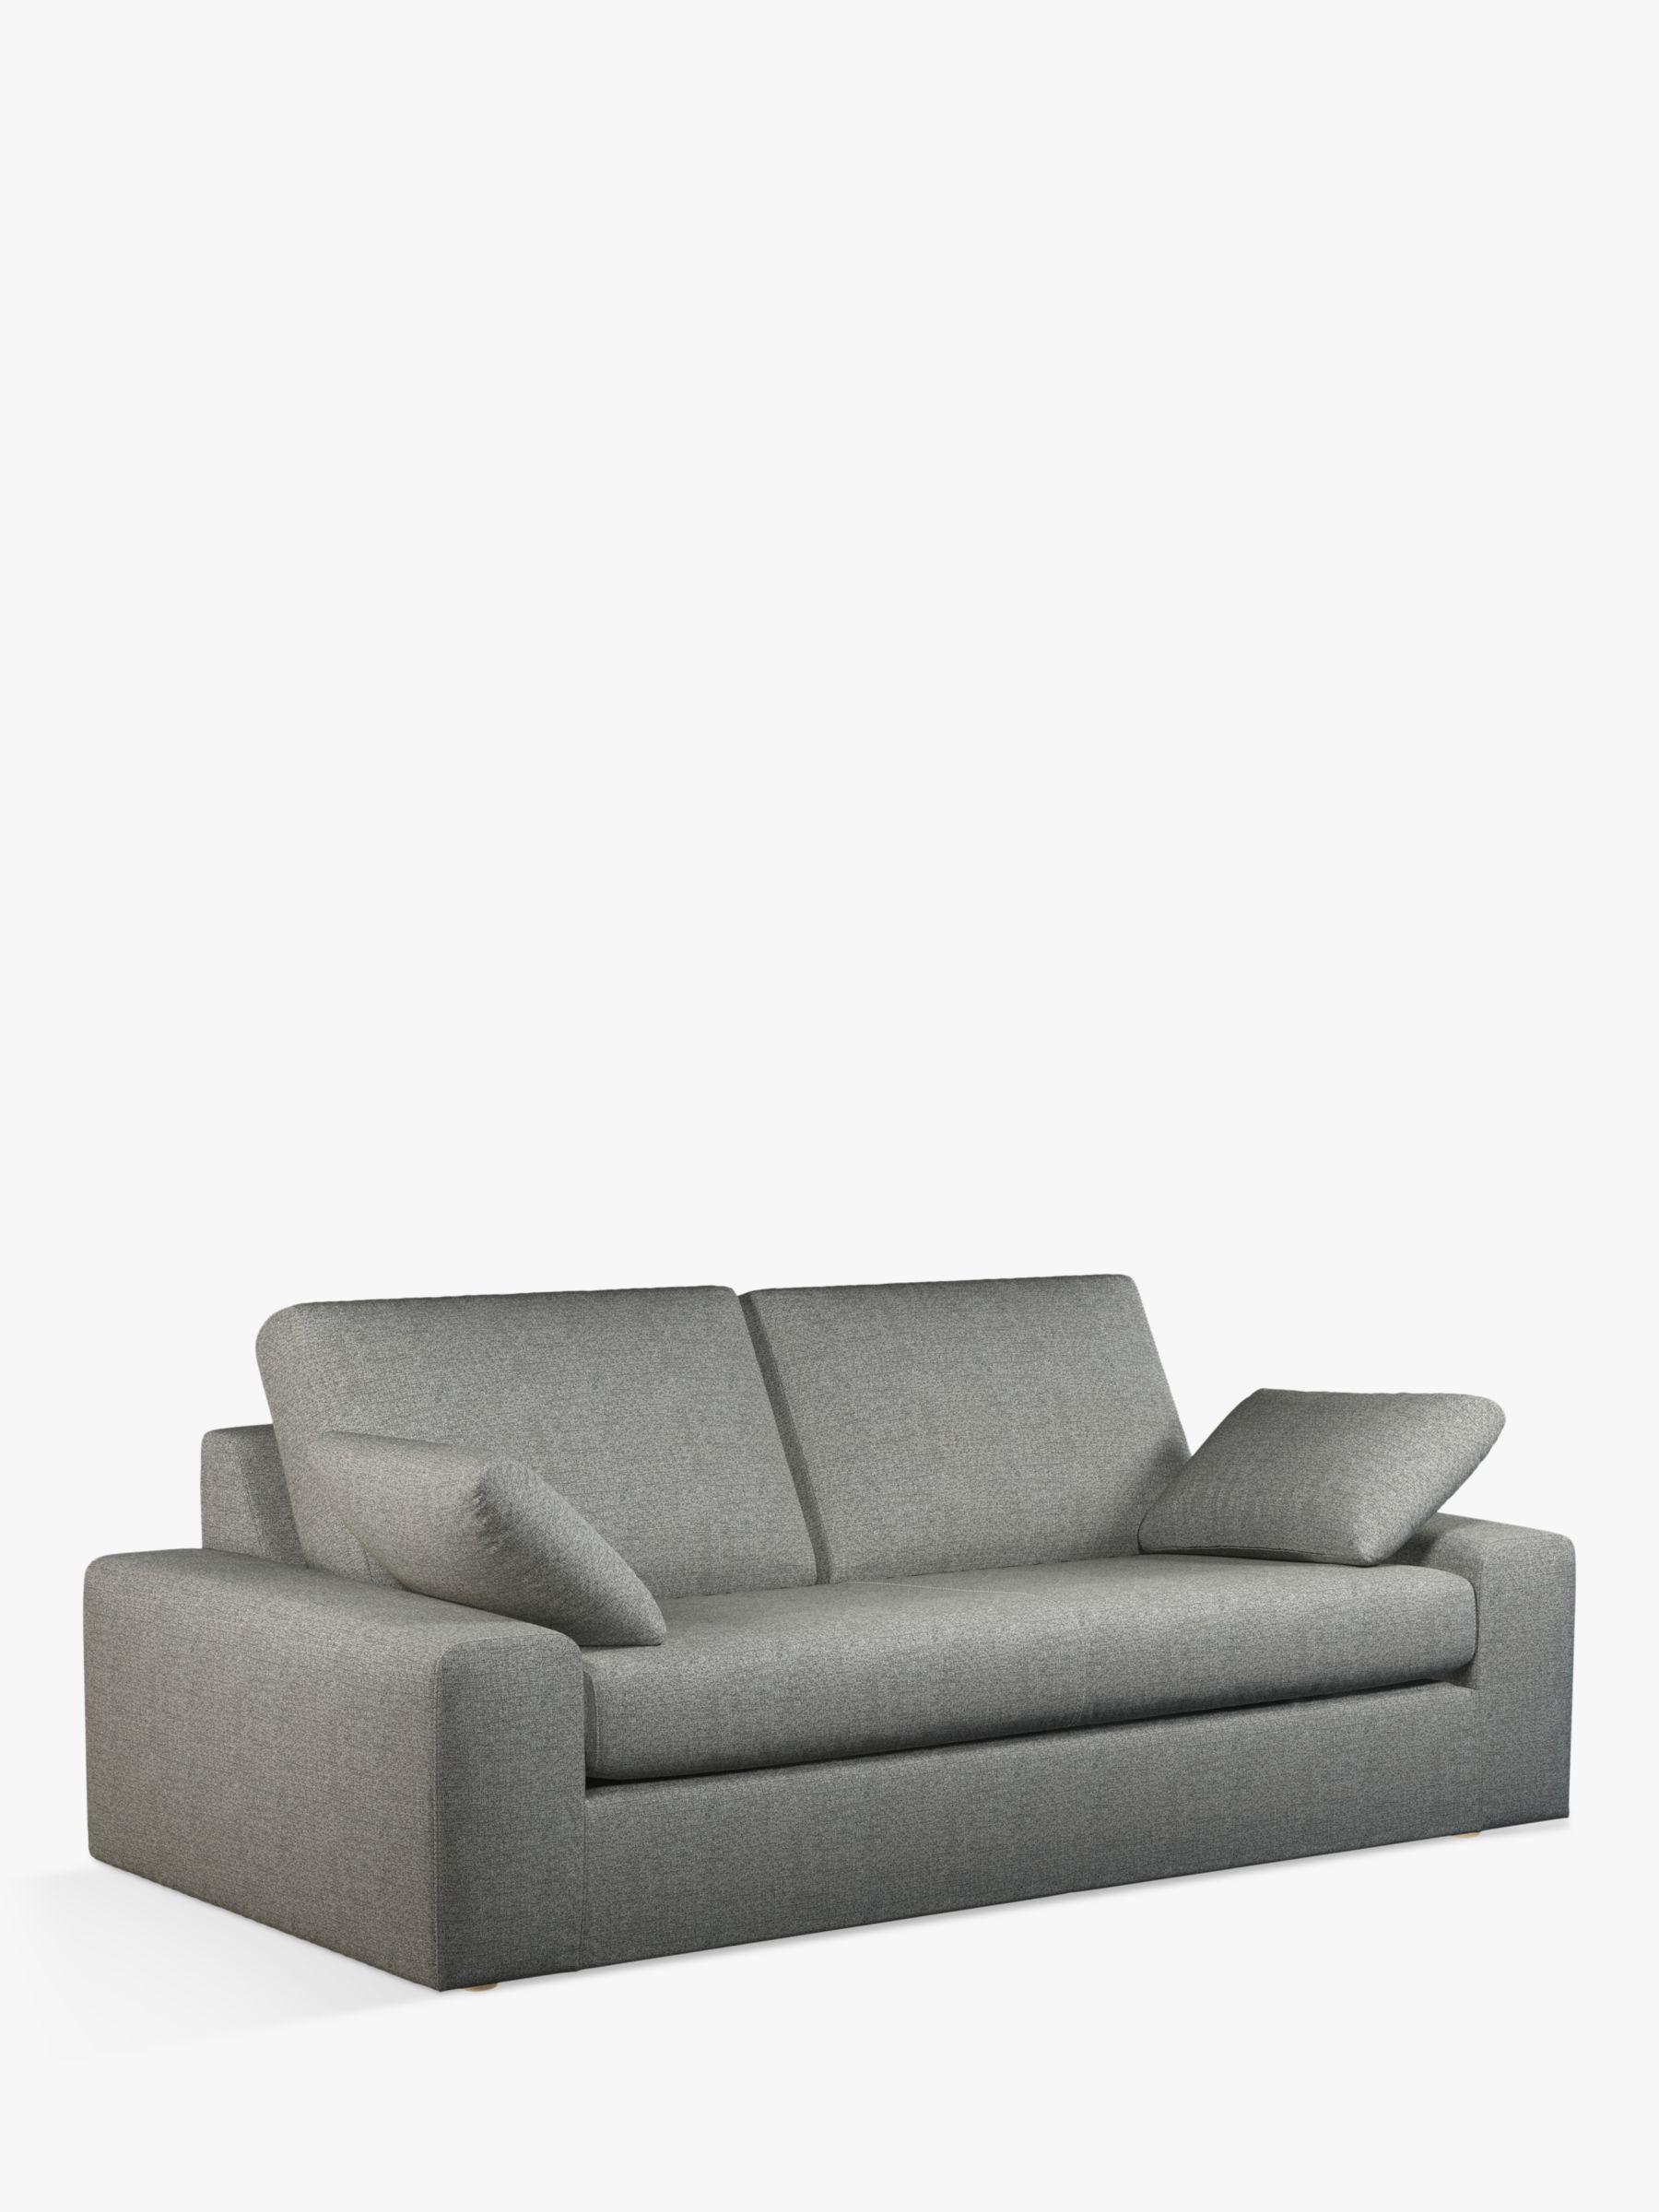 John Lewis & Partners Prism Grand 4 Seater Sofa, Light Leg